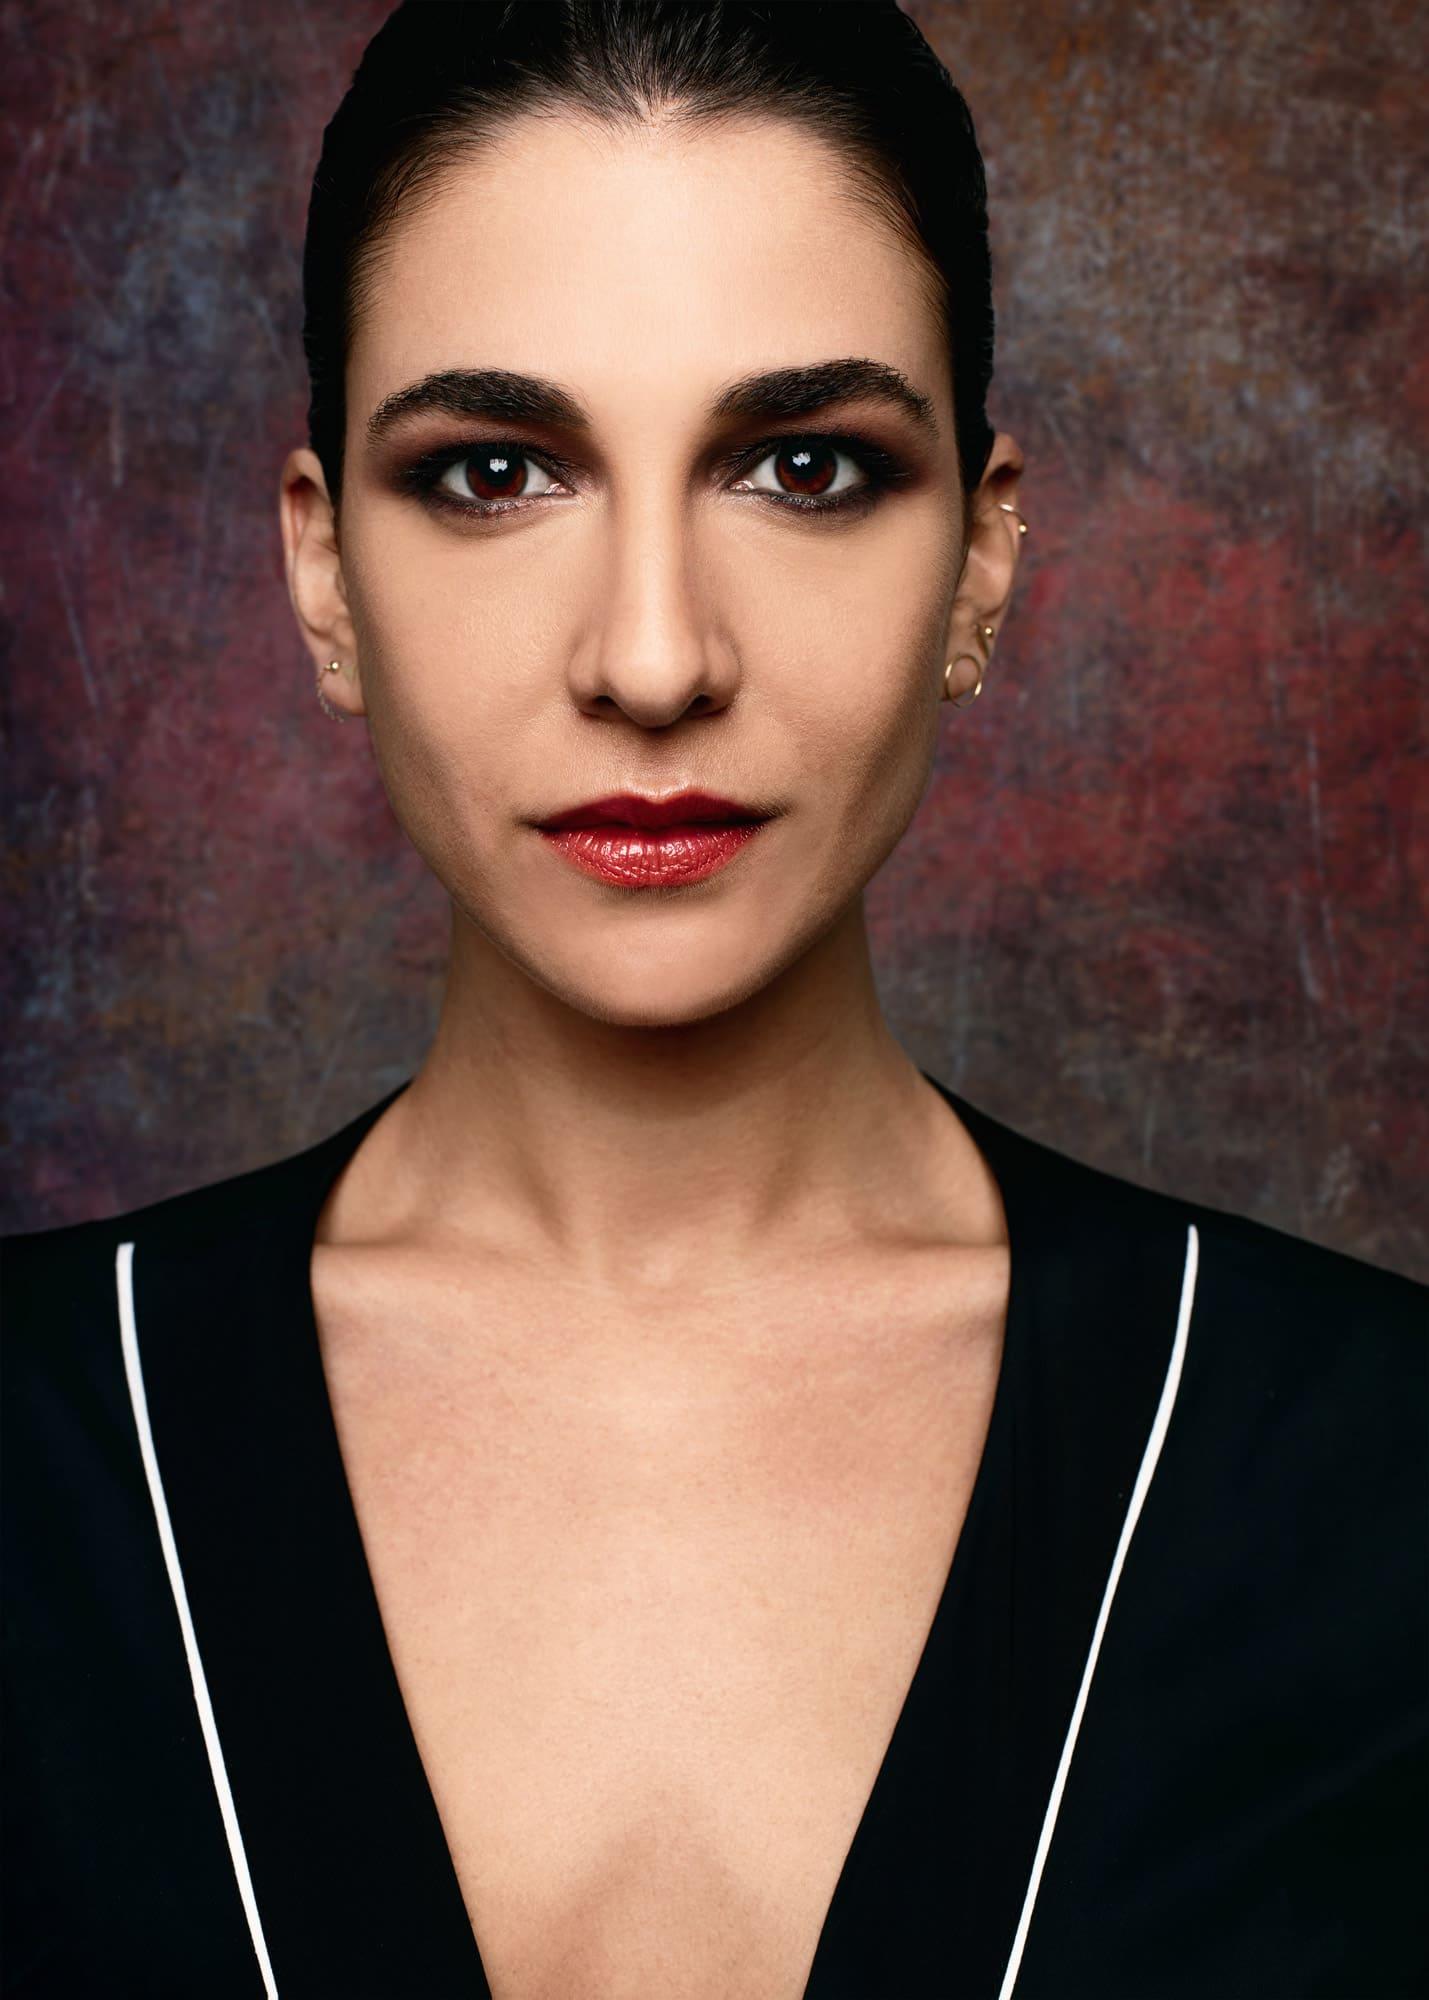 La Gallarda Fotografia Sesion Fotografica Retrato Boudoir Personal Branding Fotografo profesional Malaga Alhaurin de la Torre book modelo moda editorial